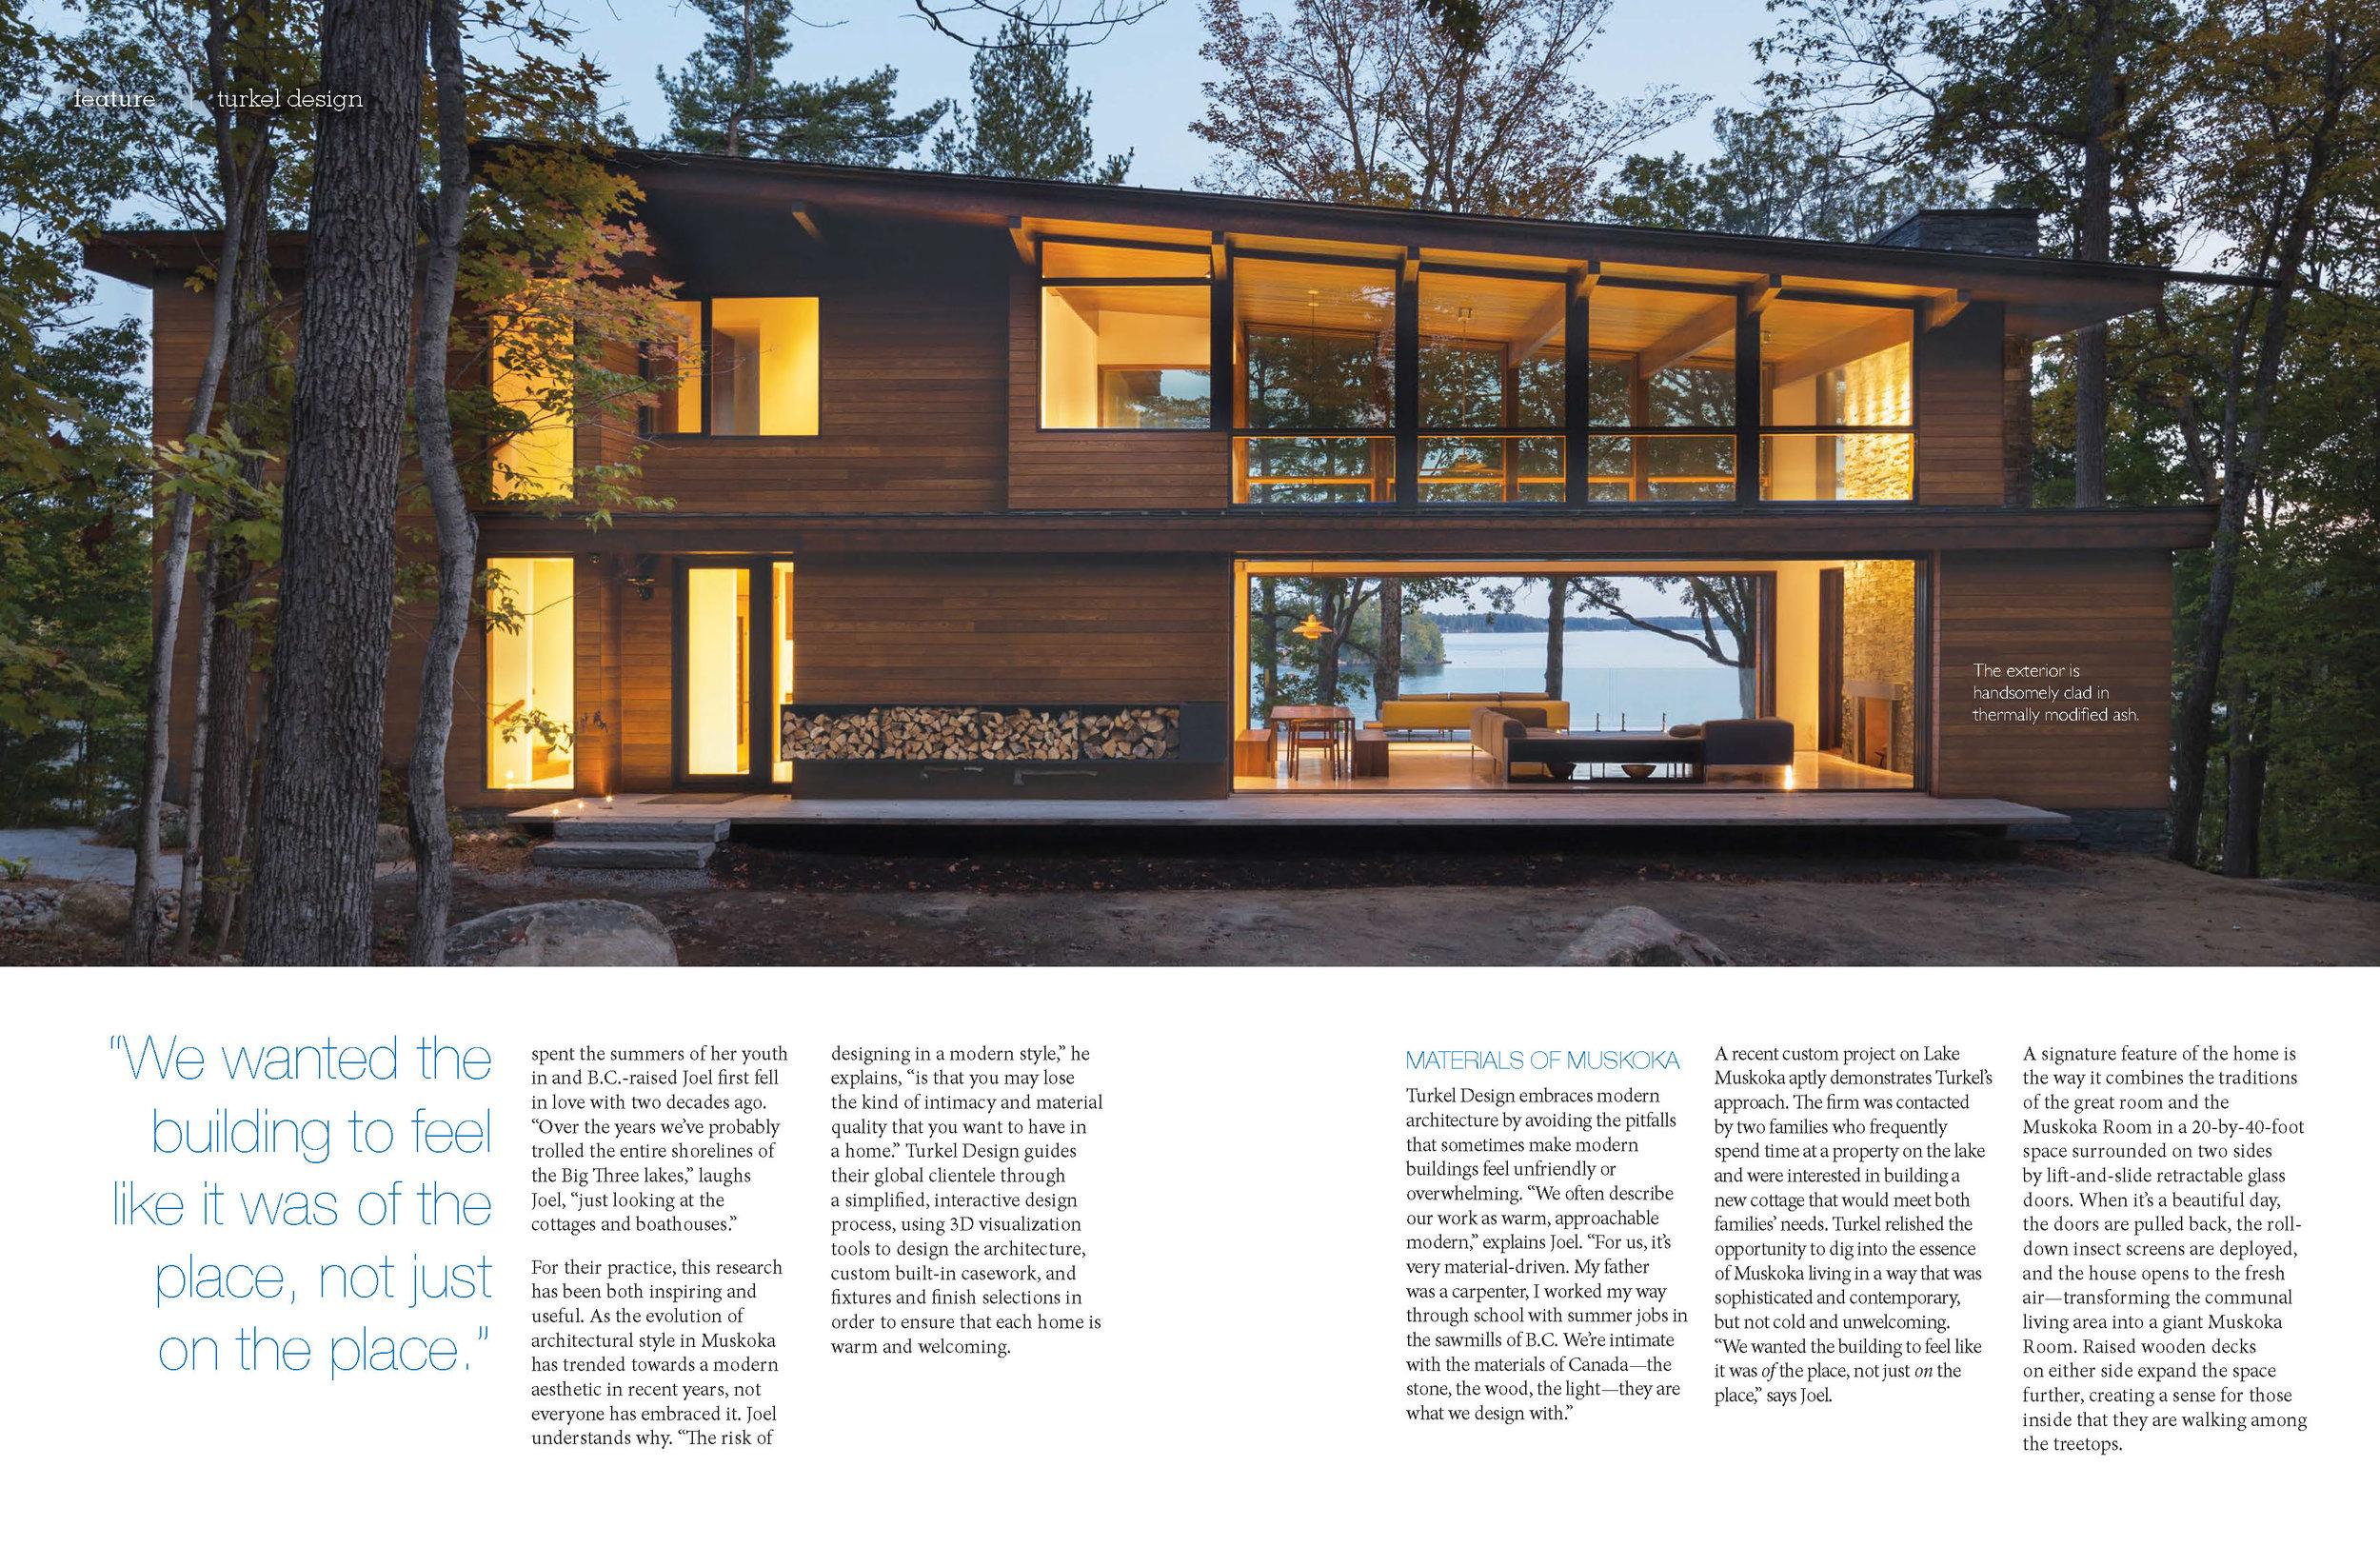 turkel_design_modern_prefab_home_muskoka_hideaways_Page_2.jpg